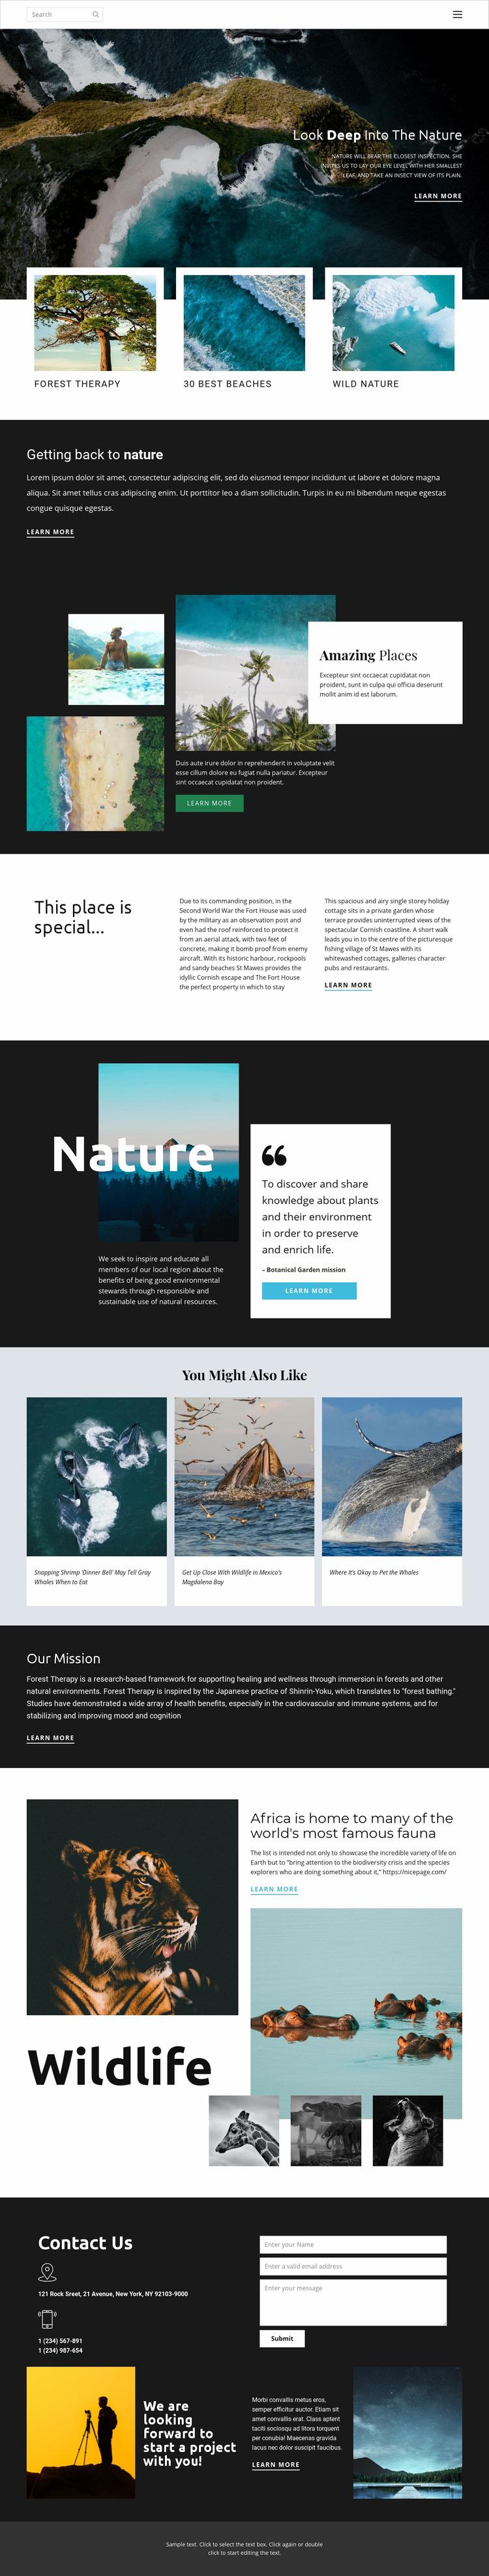 Exploring wildlife and nature Website Maker